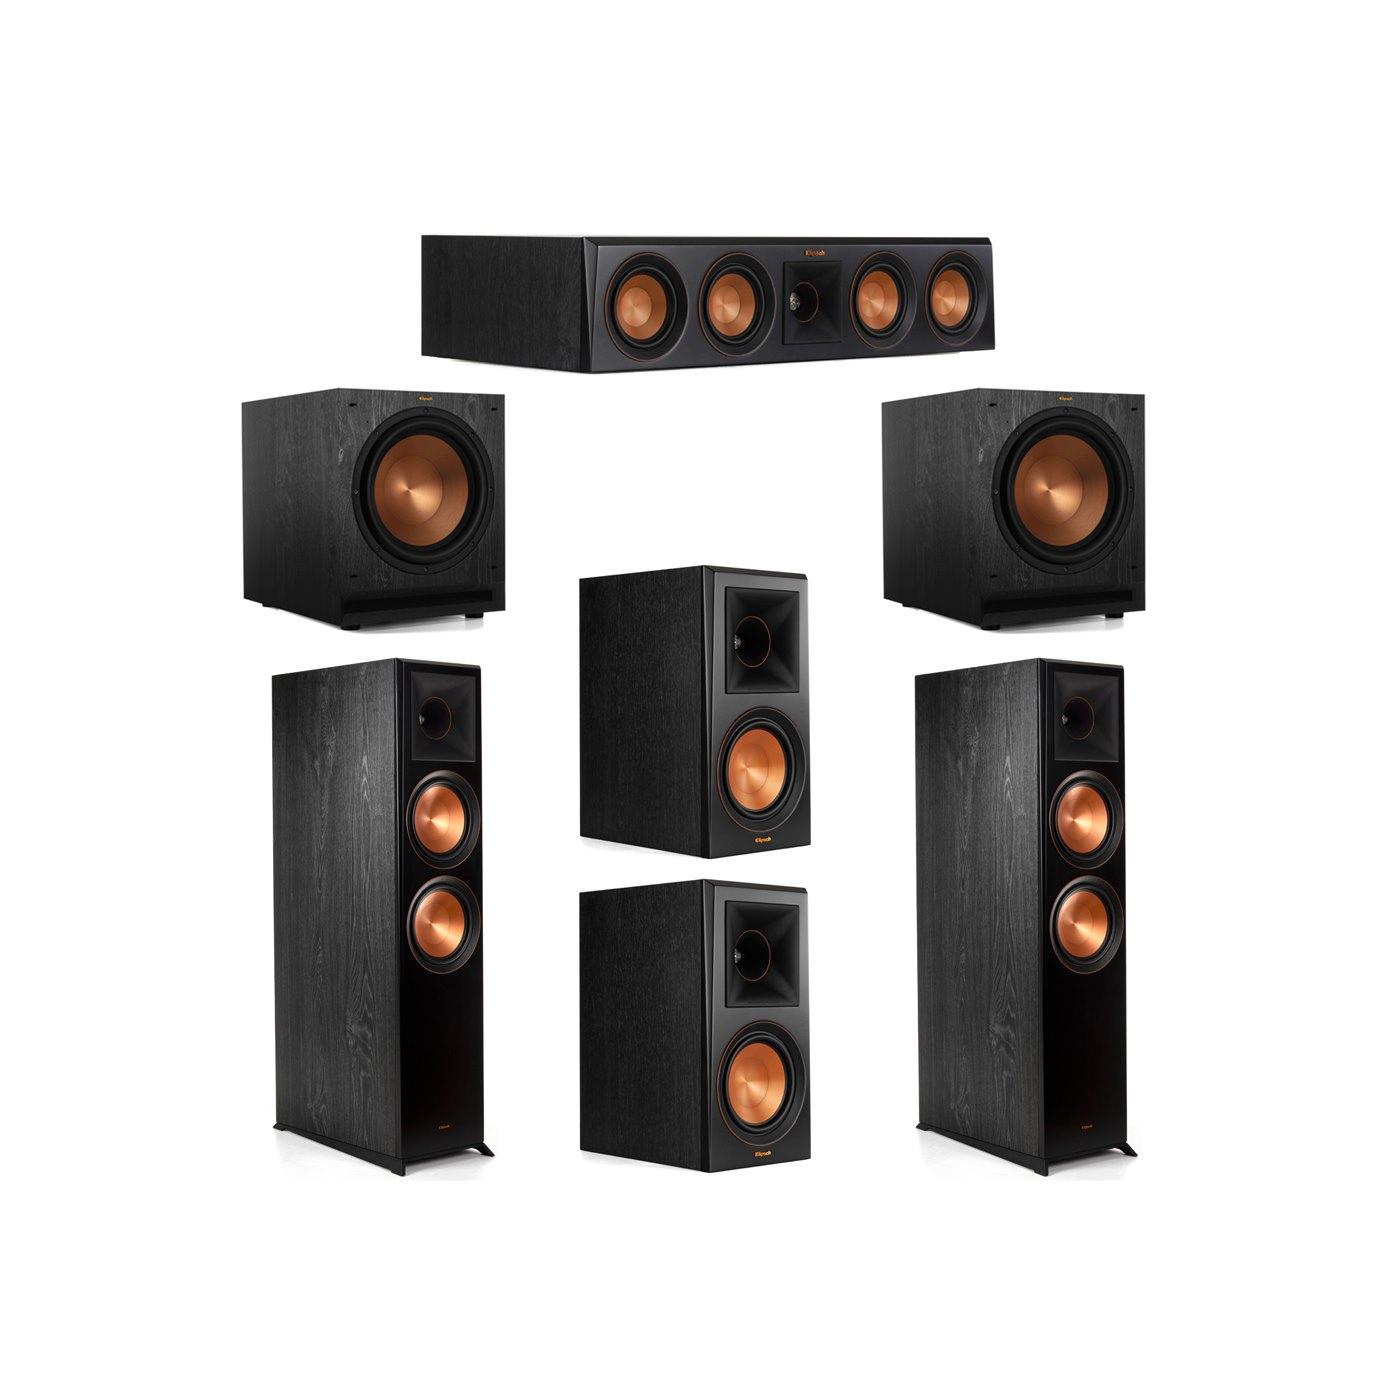 Klipsch 5.2 System with 2 RP-8000F Floorstanding Speakers, 1 Klipsch RP-404C Center Speaker, 2 Klipsch RP-600M Surround Speakers, 2 Klipsch SPL-120 Subwoofers